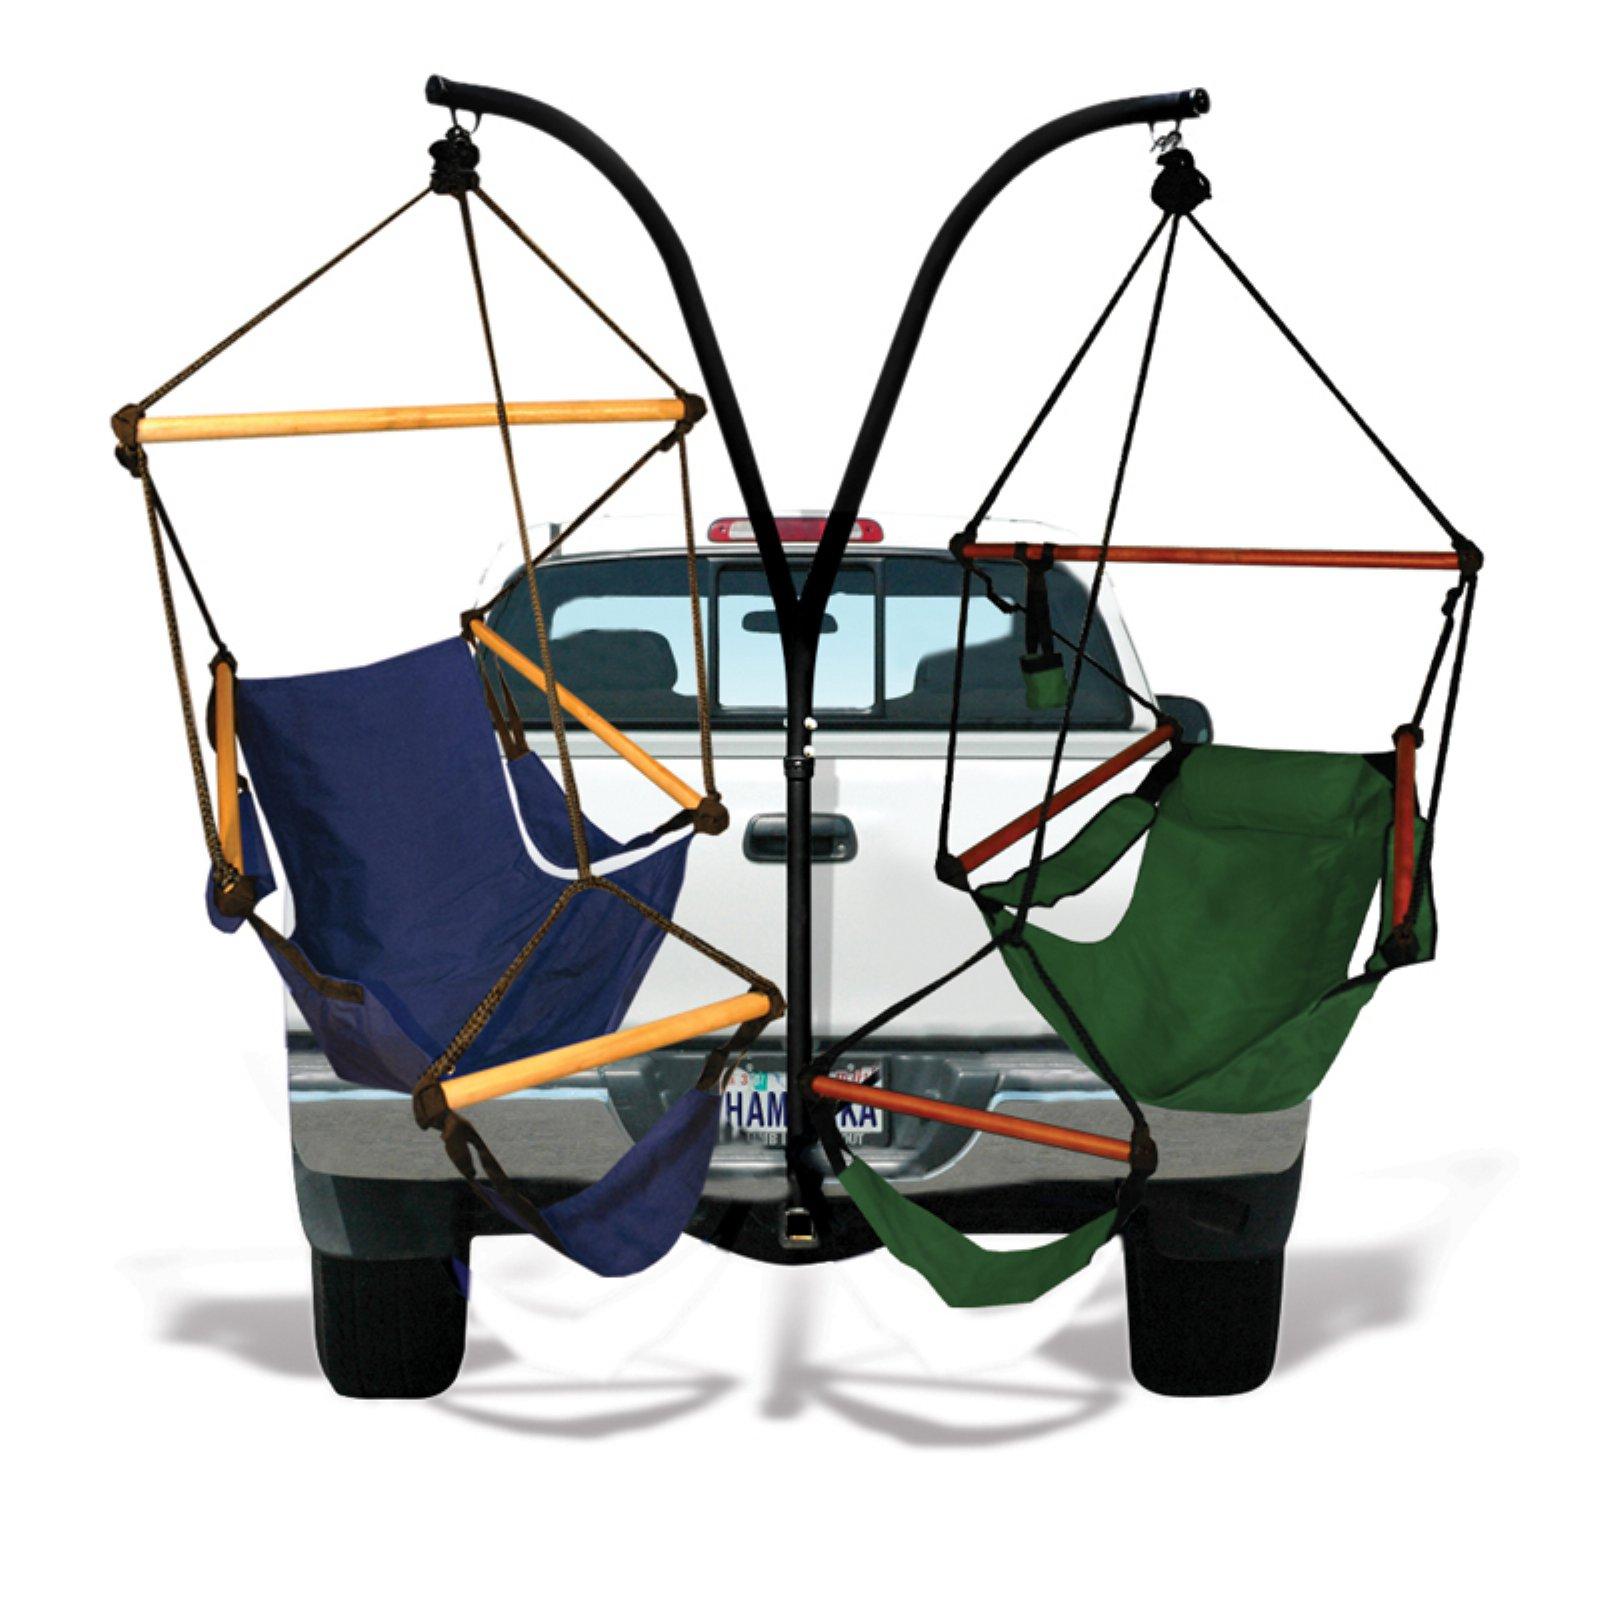 Superieur Hammaka Trailer Hitch Hanging Chair Stand With Hammaka Chairs   Walmart.com